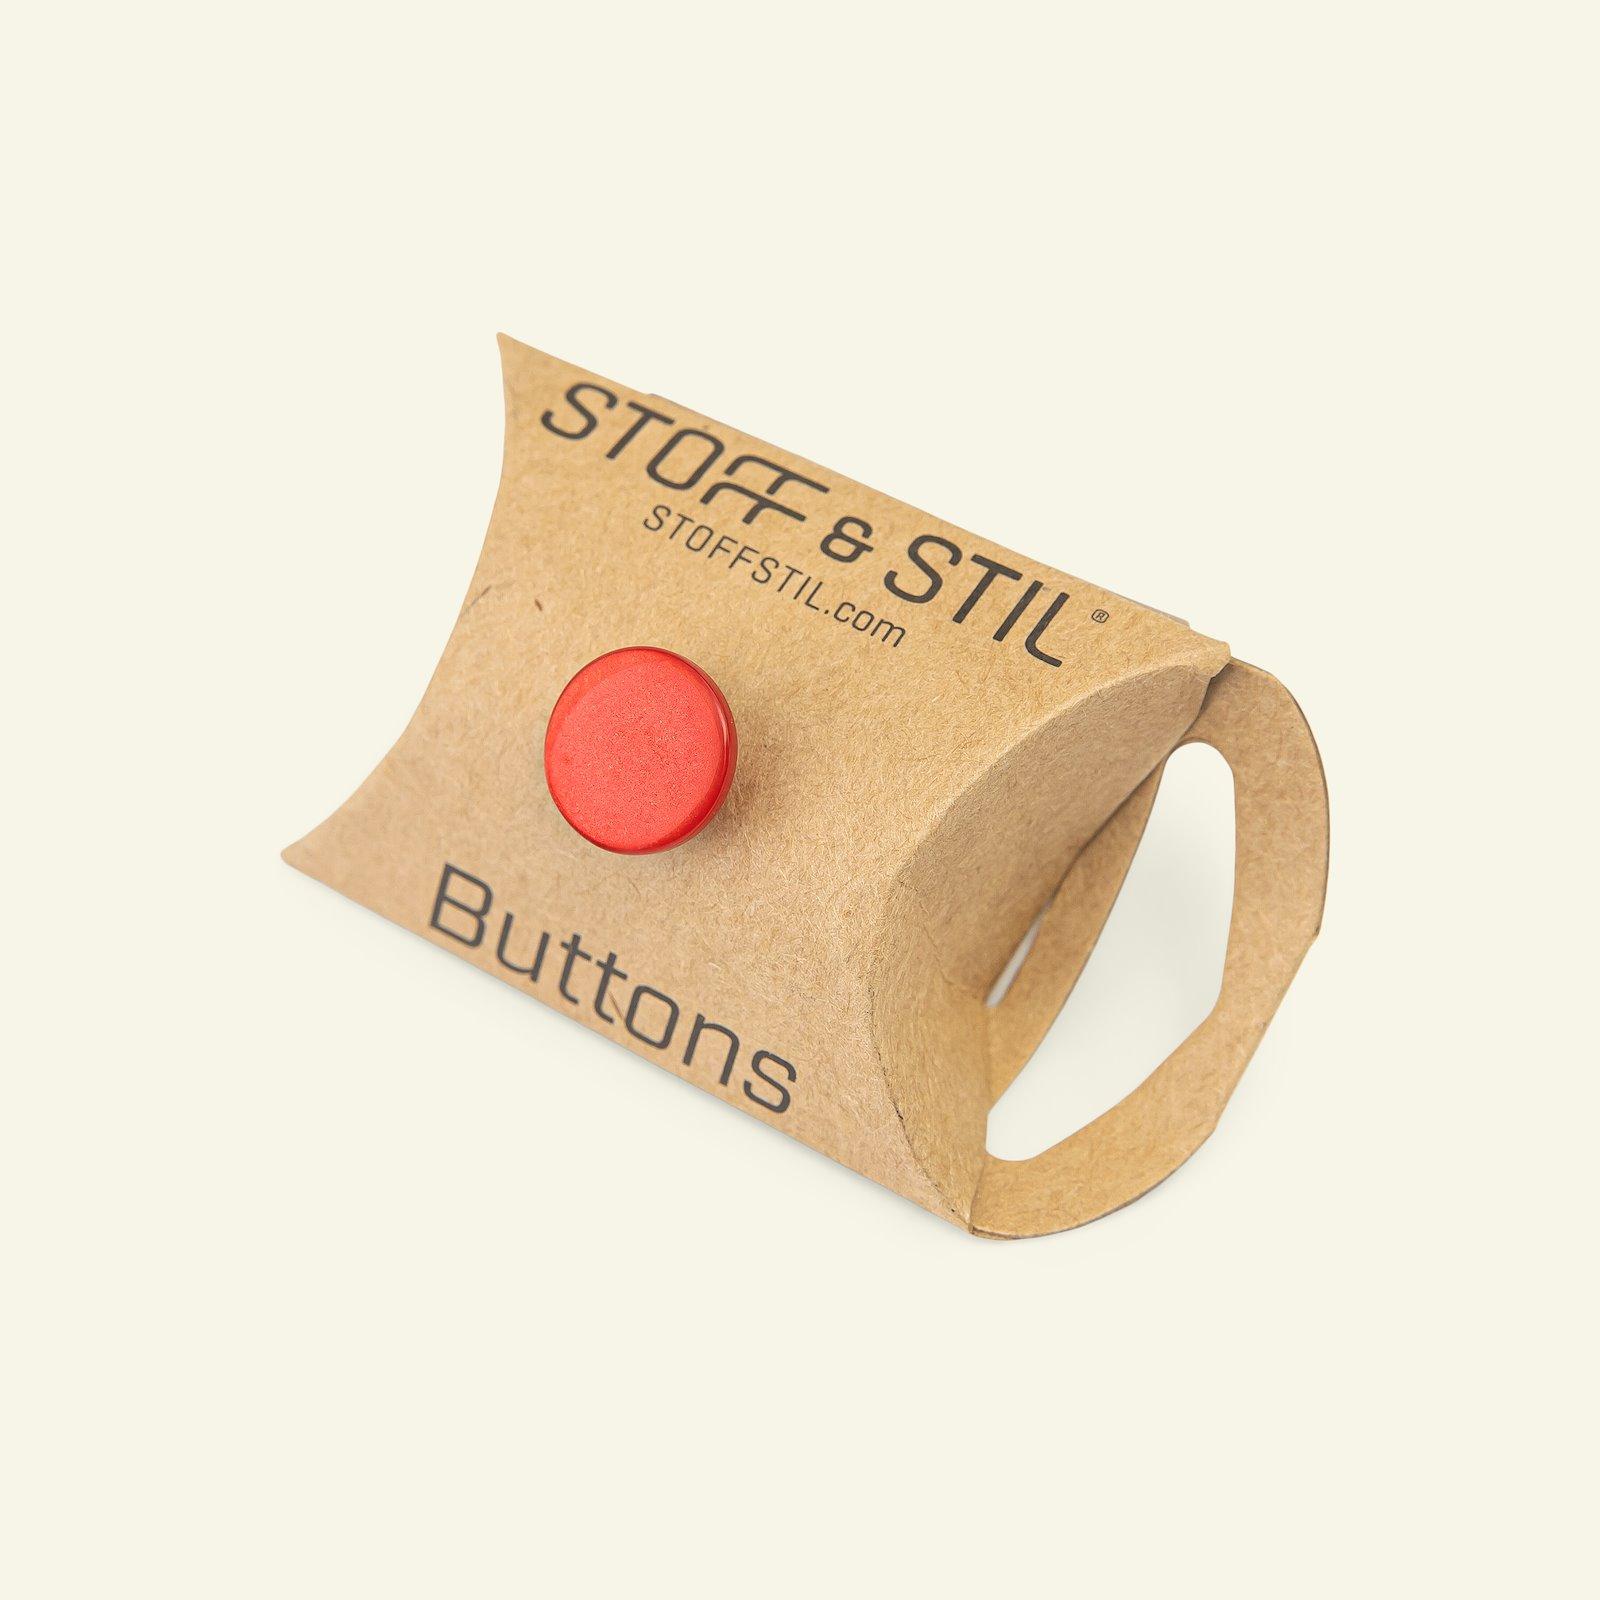 Shank button shiny 14mm red 6pcs 33334_pack_b